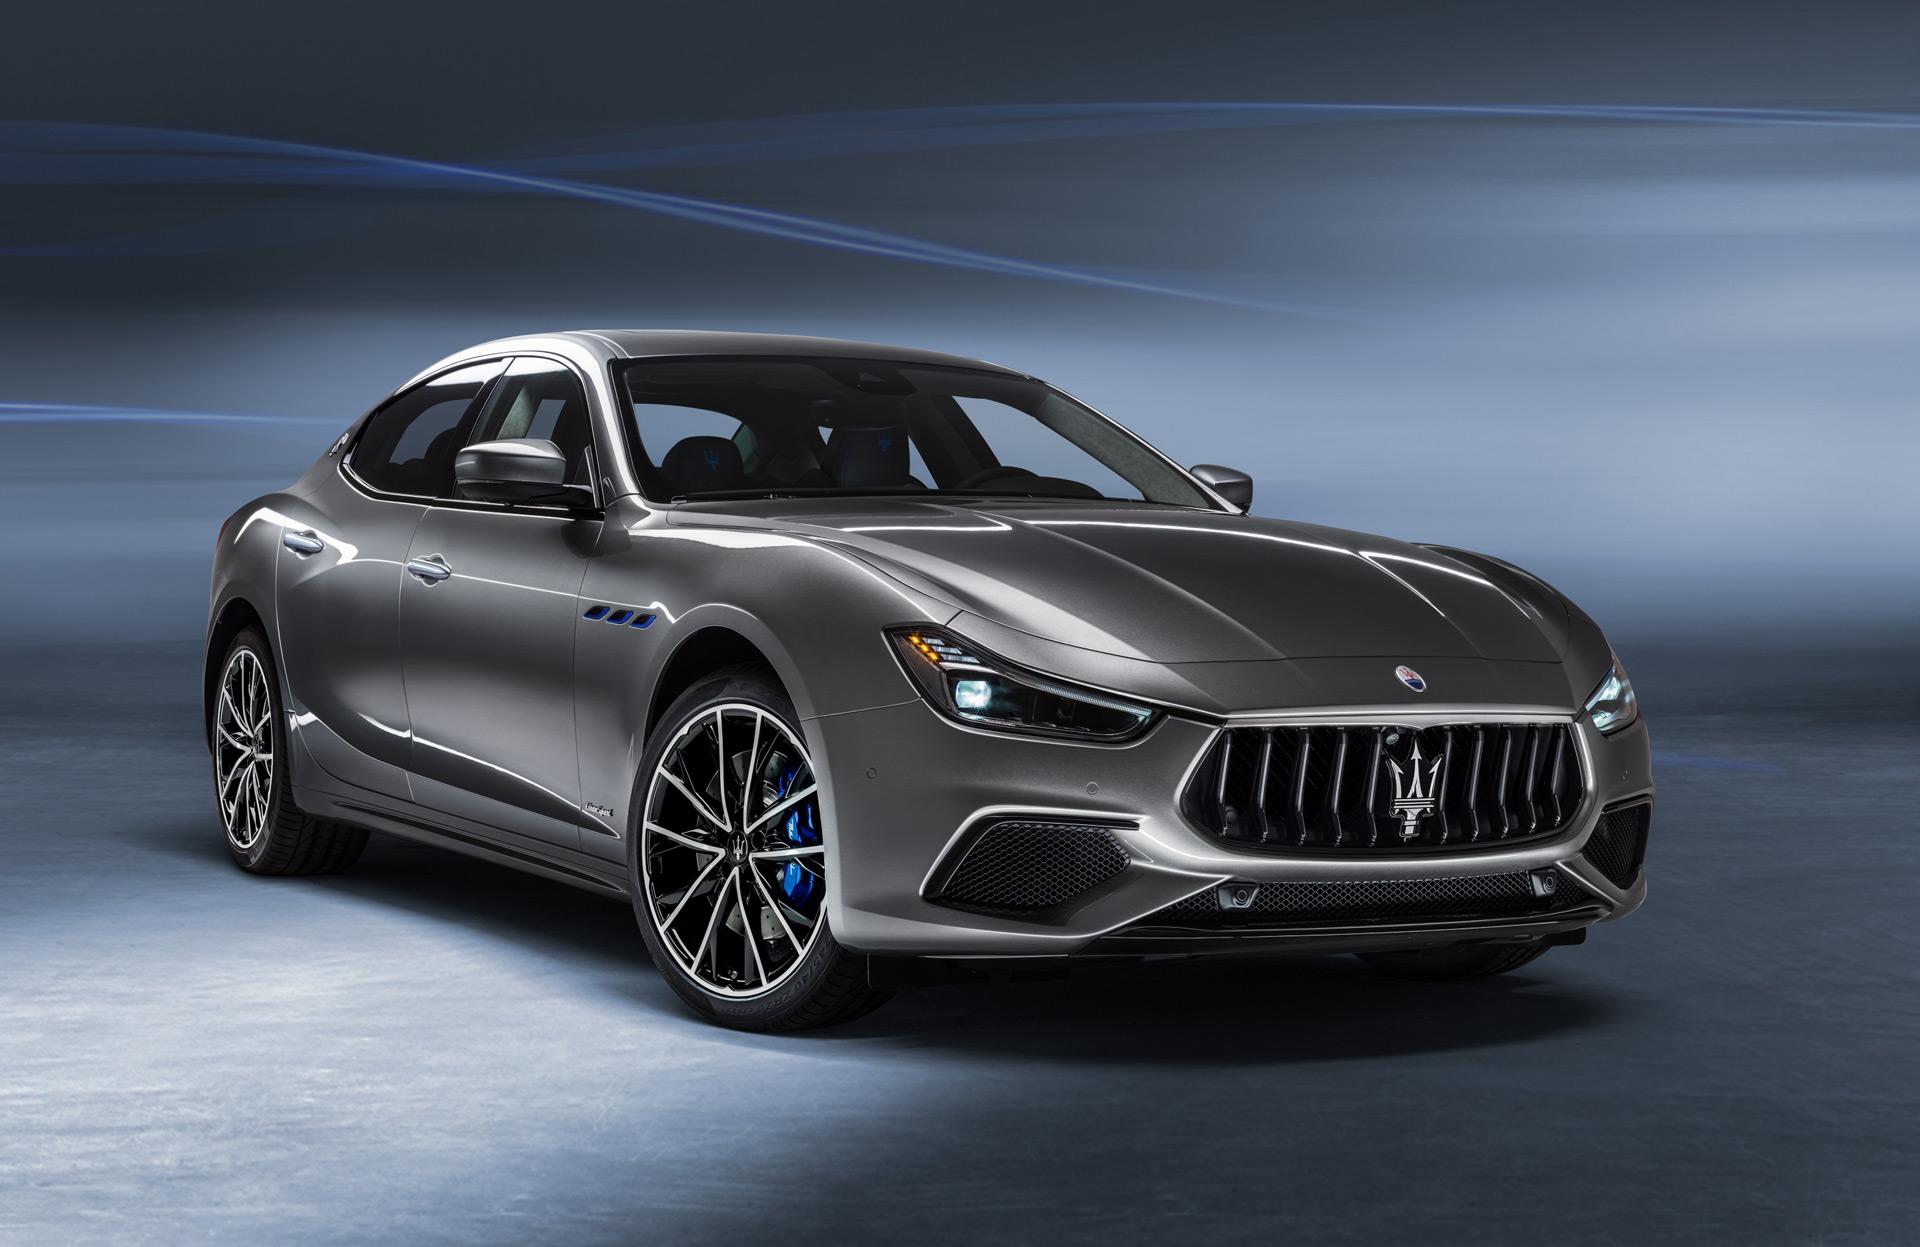 2021 Maserati Ghibli Hybrid marks start of brand's electrification